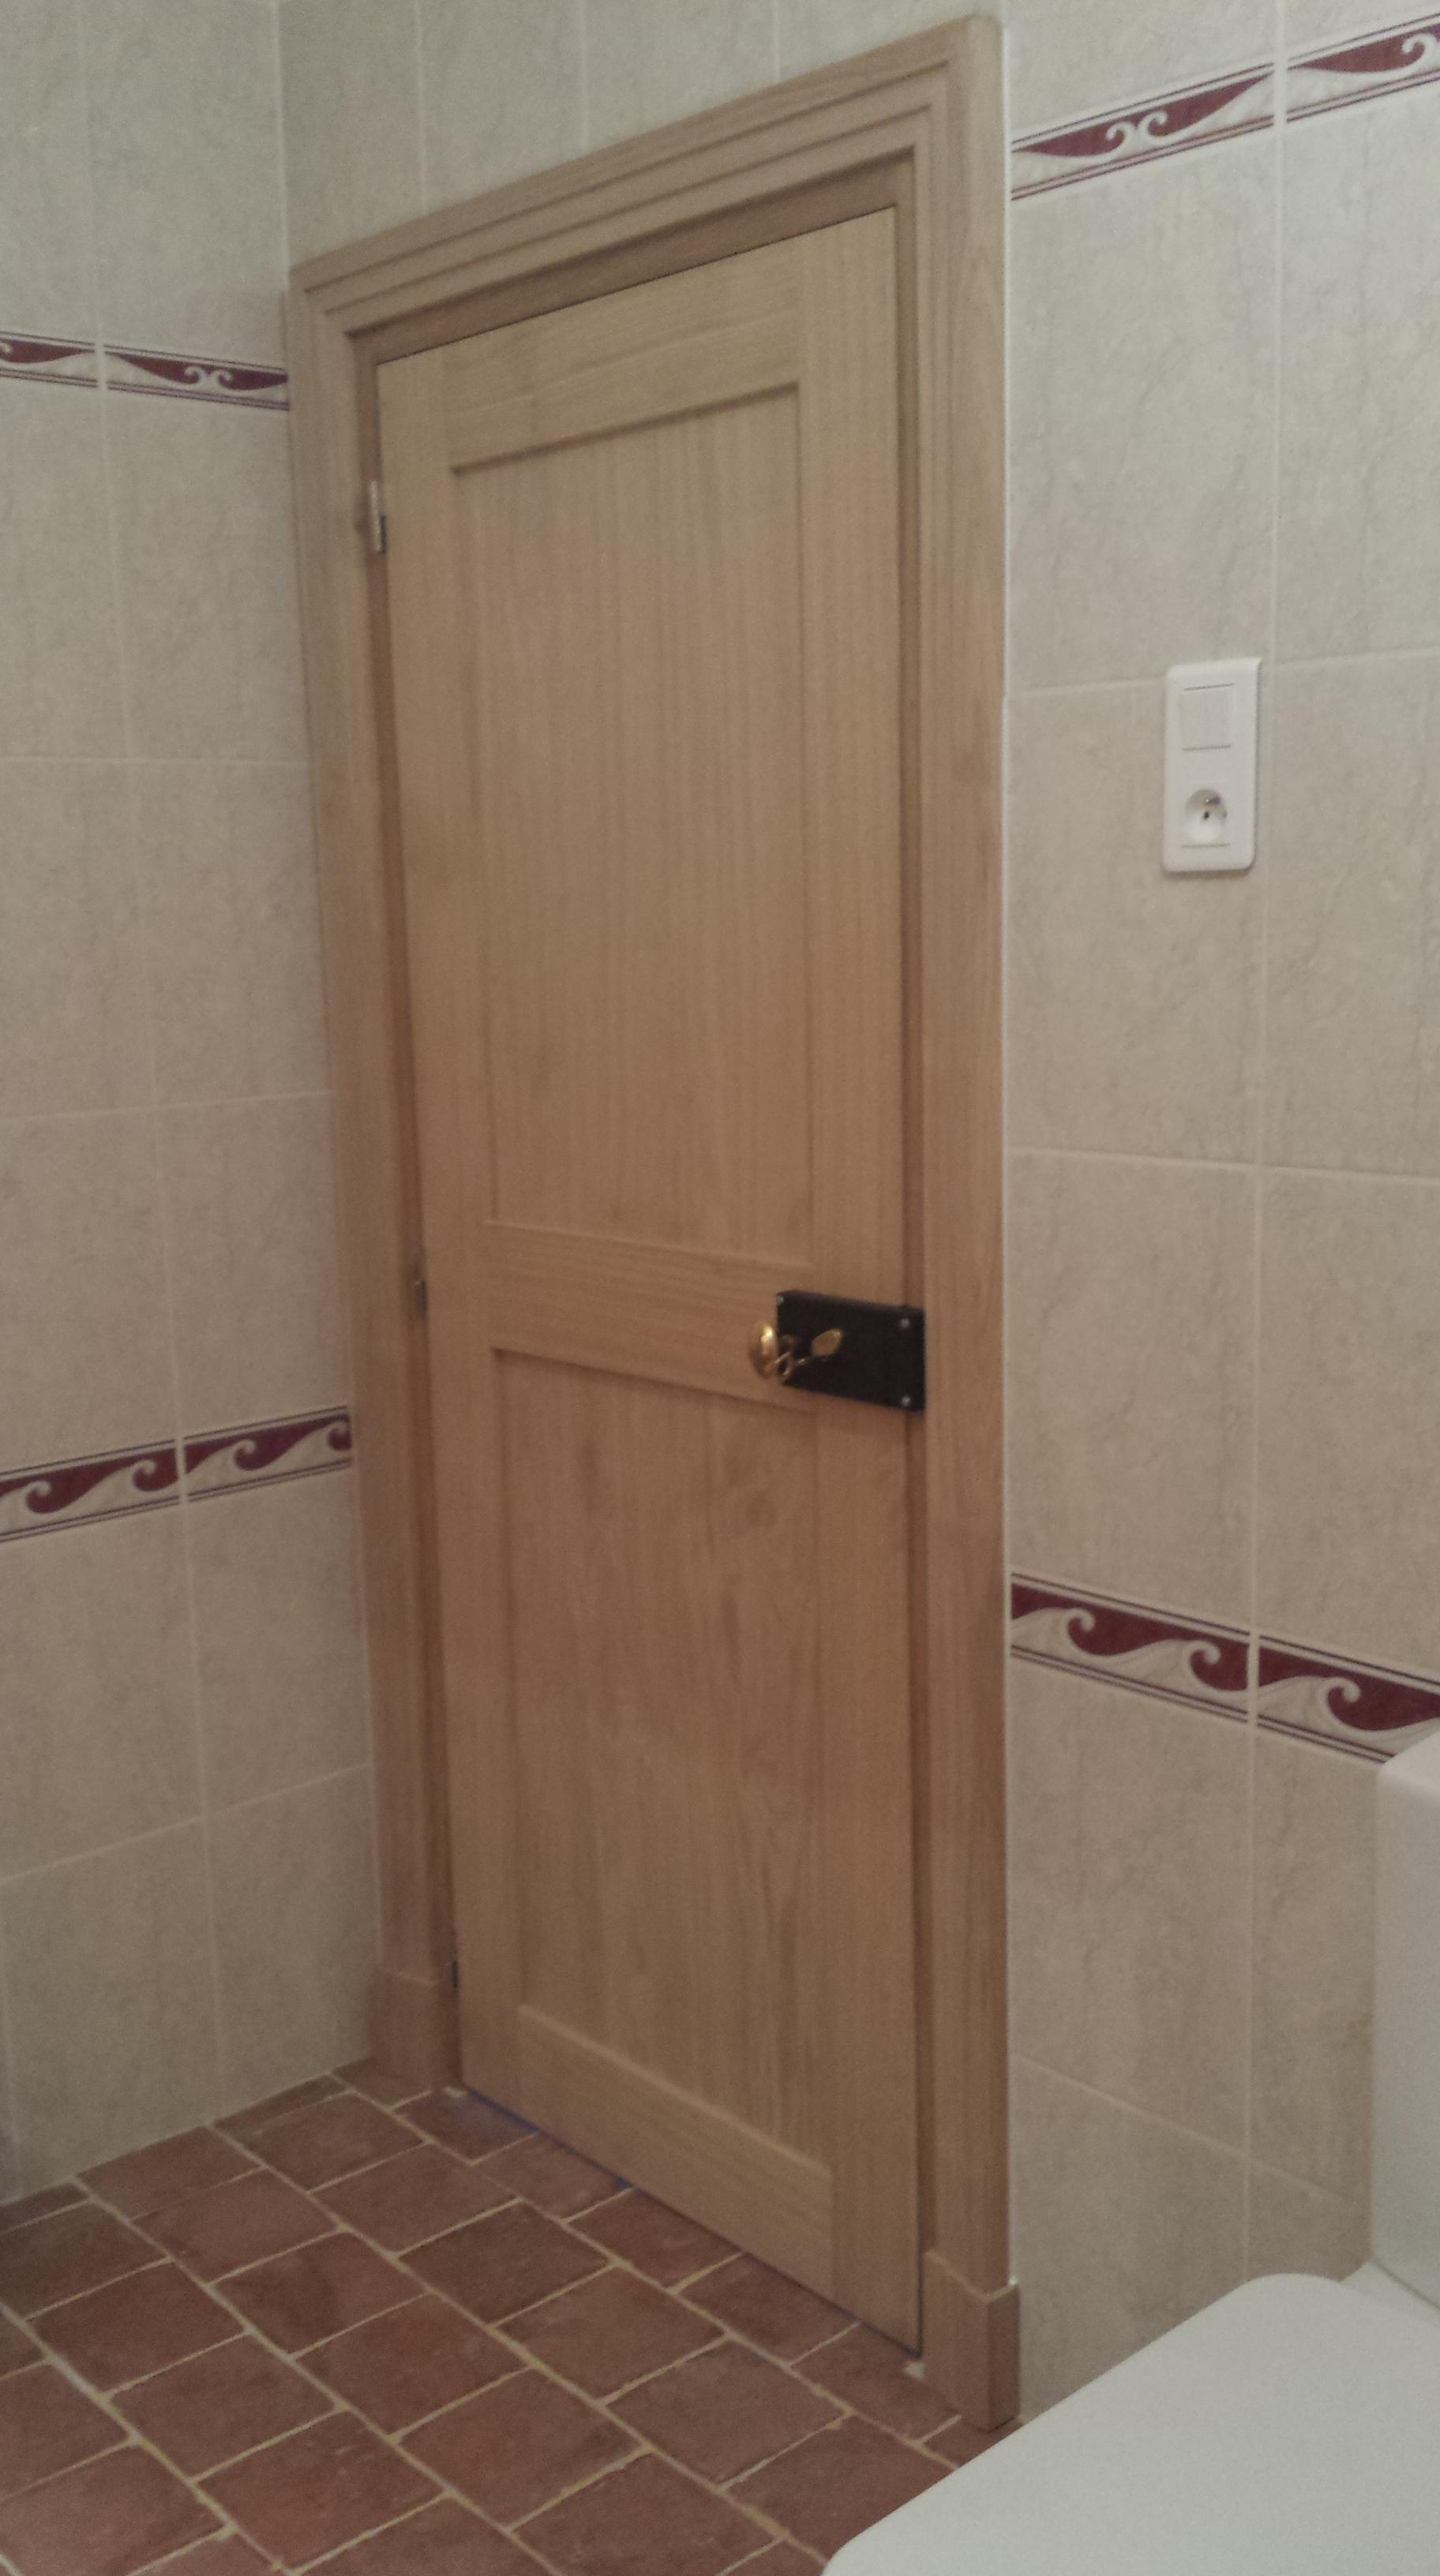 Portes d int rieur menuiserie eb nisterie teddy gandolfi for Menuiserie porte interieur